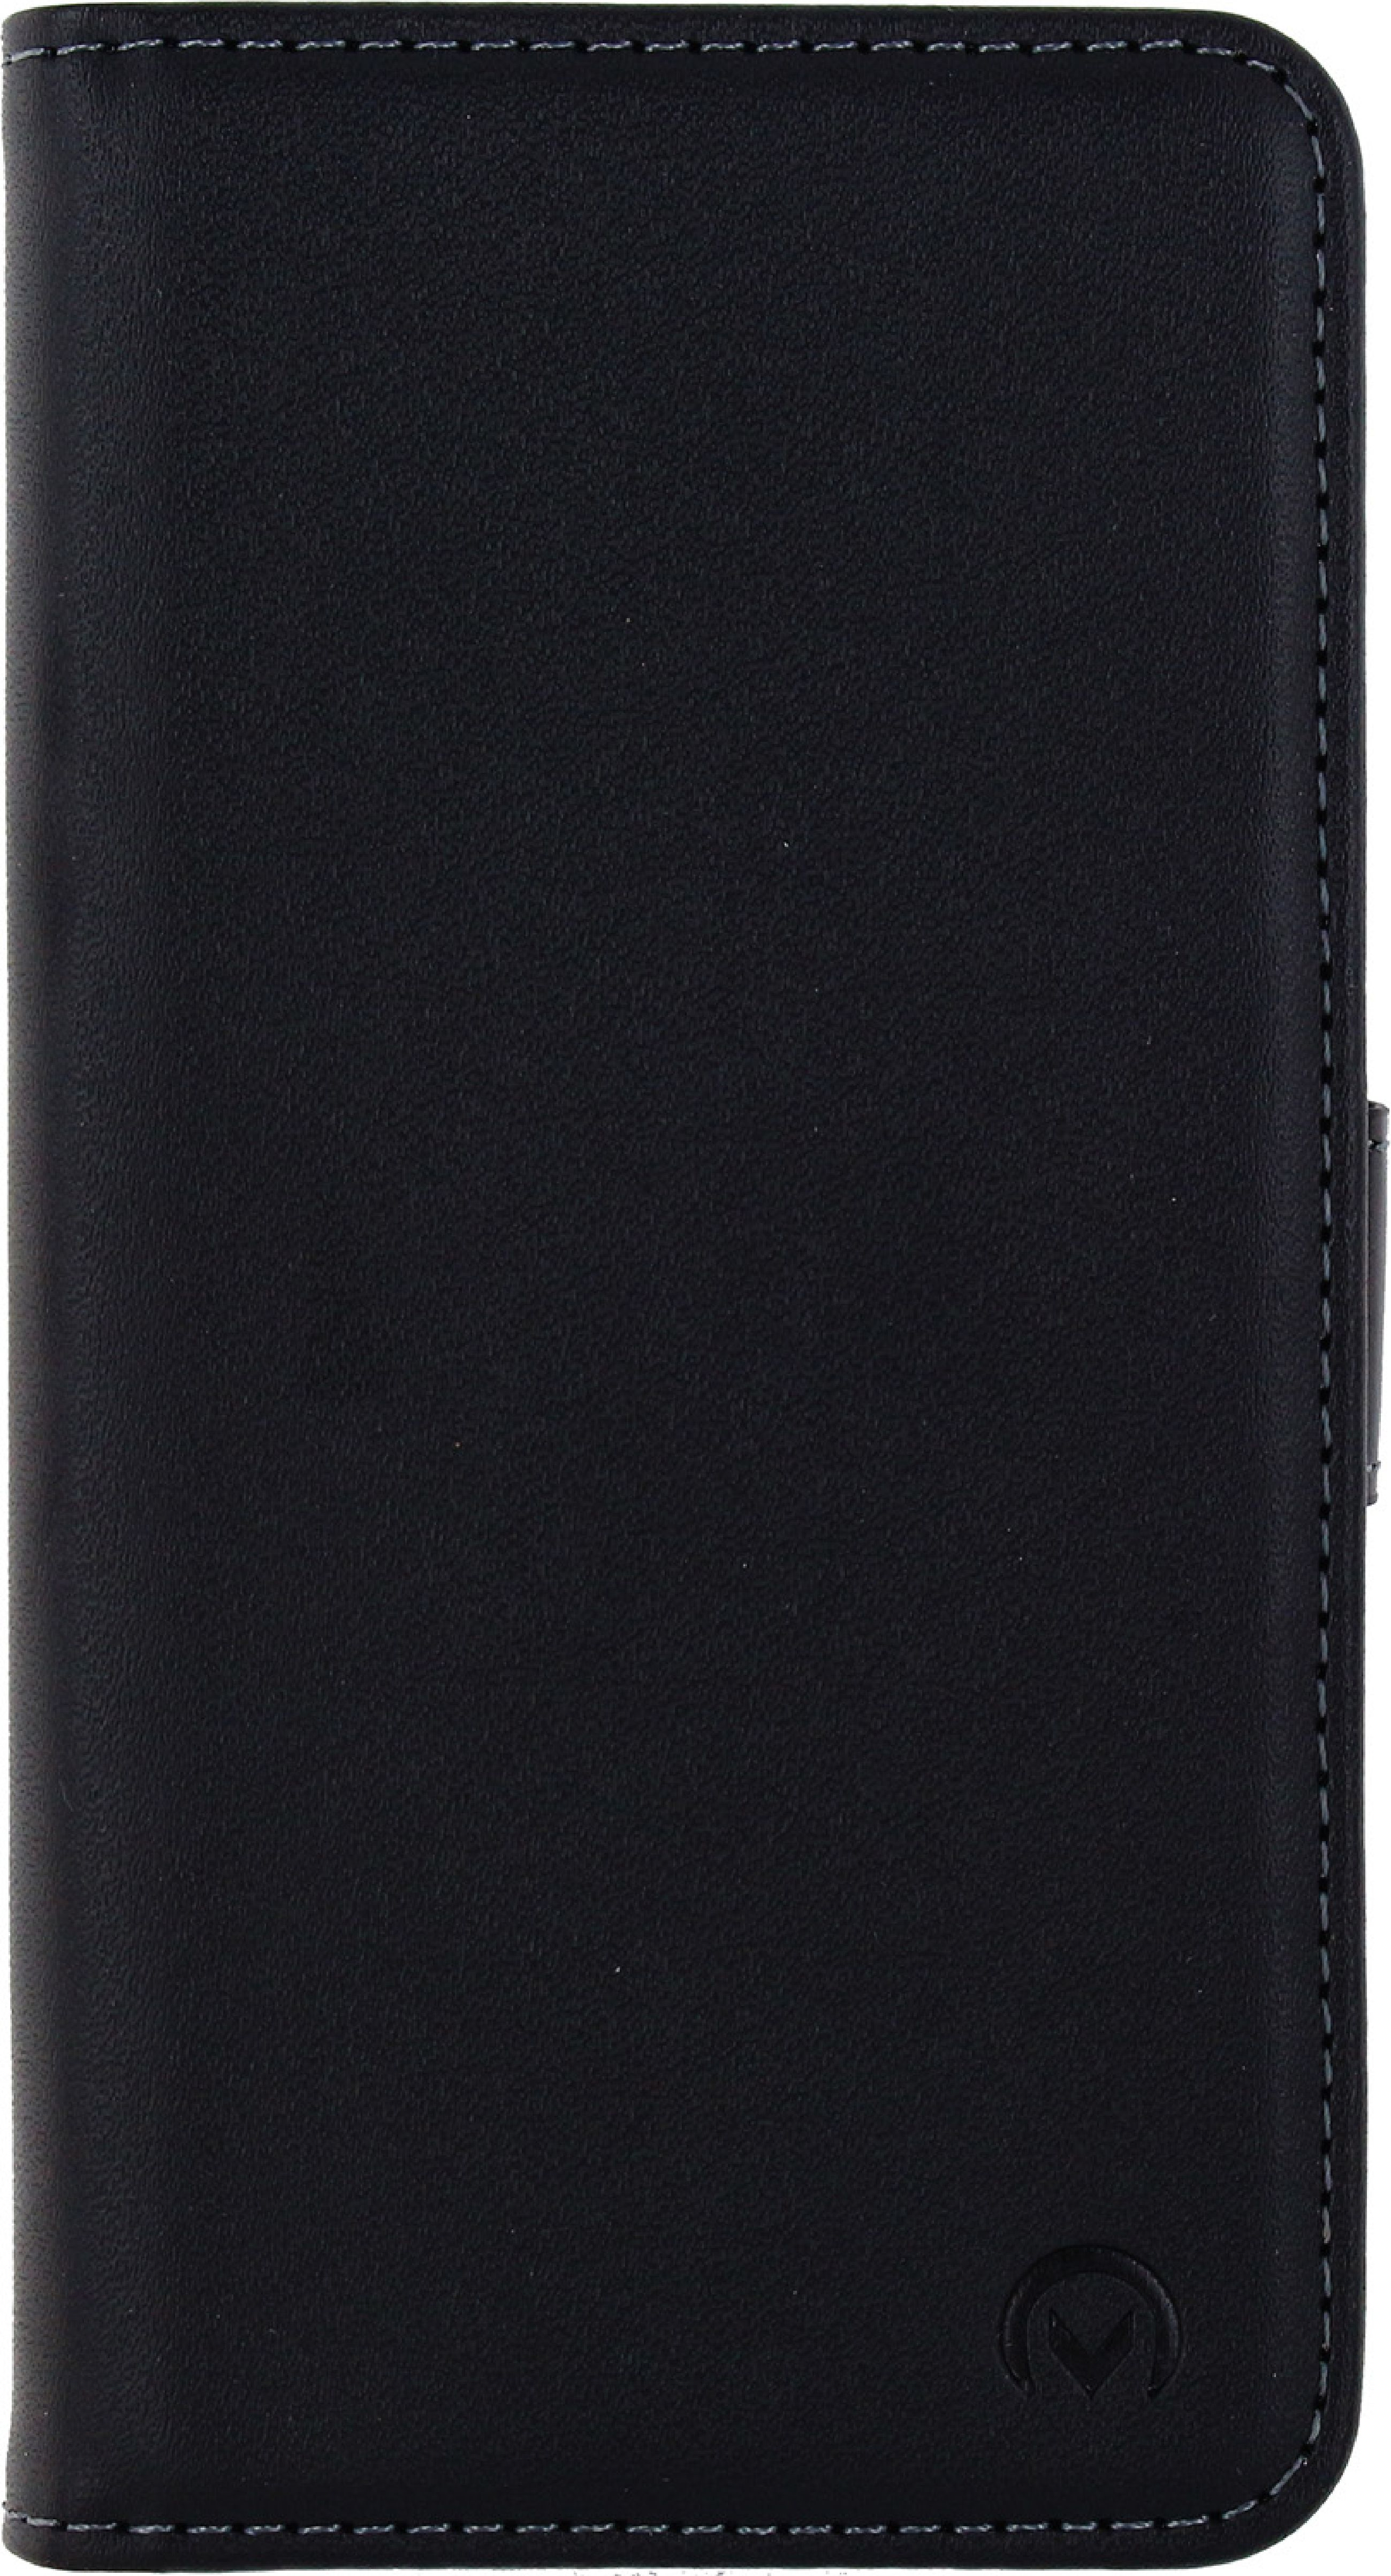 Image of   Telefon Klassisk Lommebogsetui HTC 10 Evo Sort